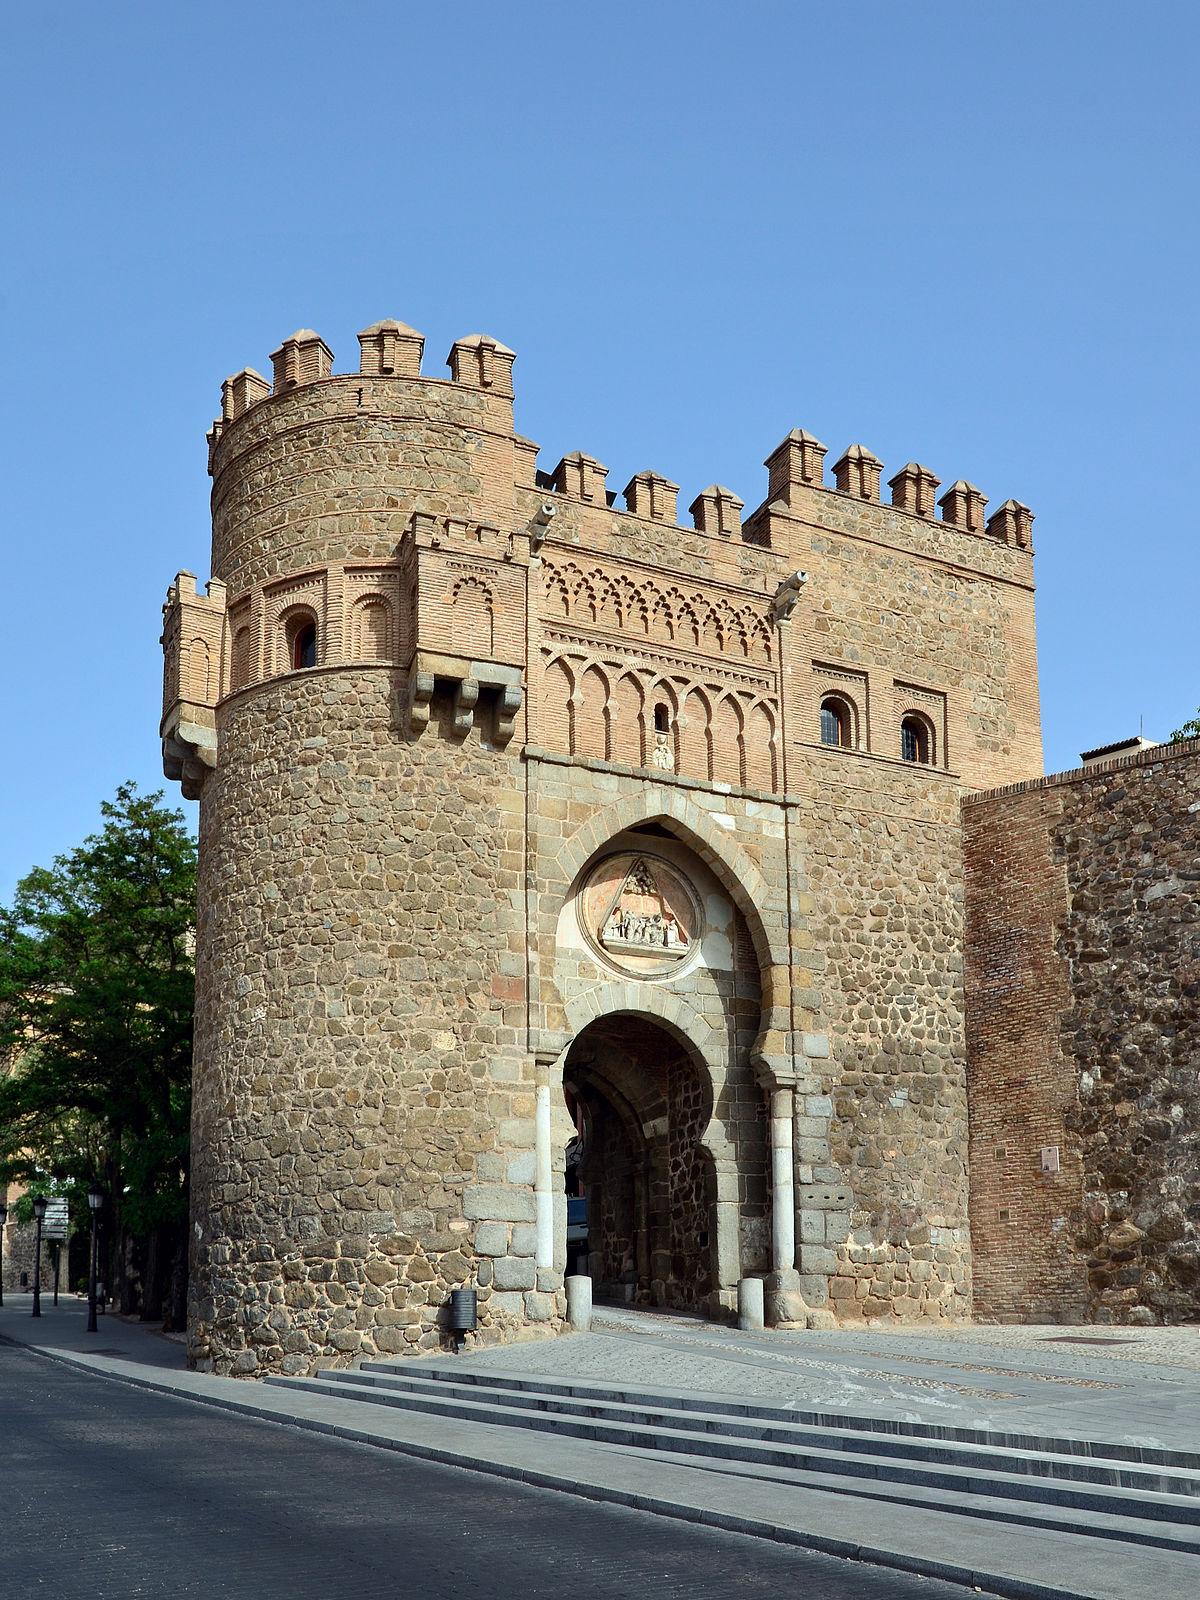 Puerta del sol toledo wikipedia for Las puertas del sol